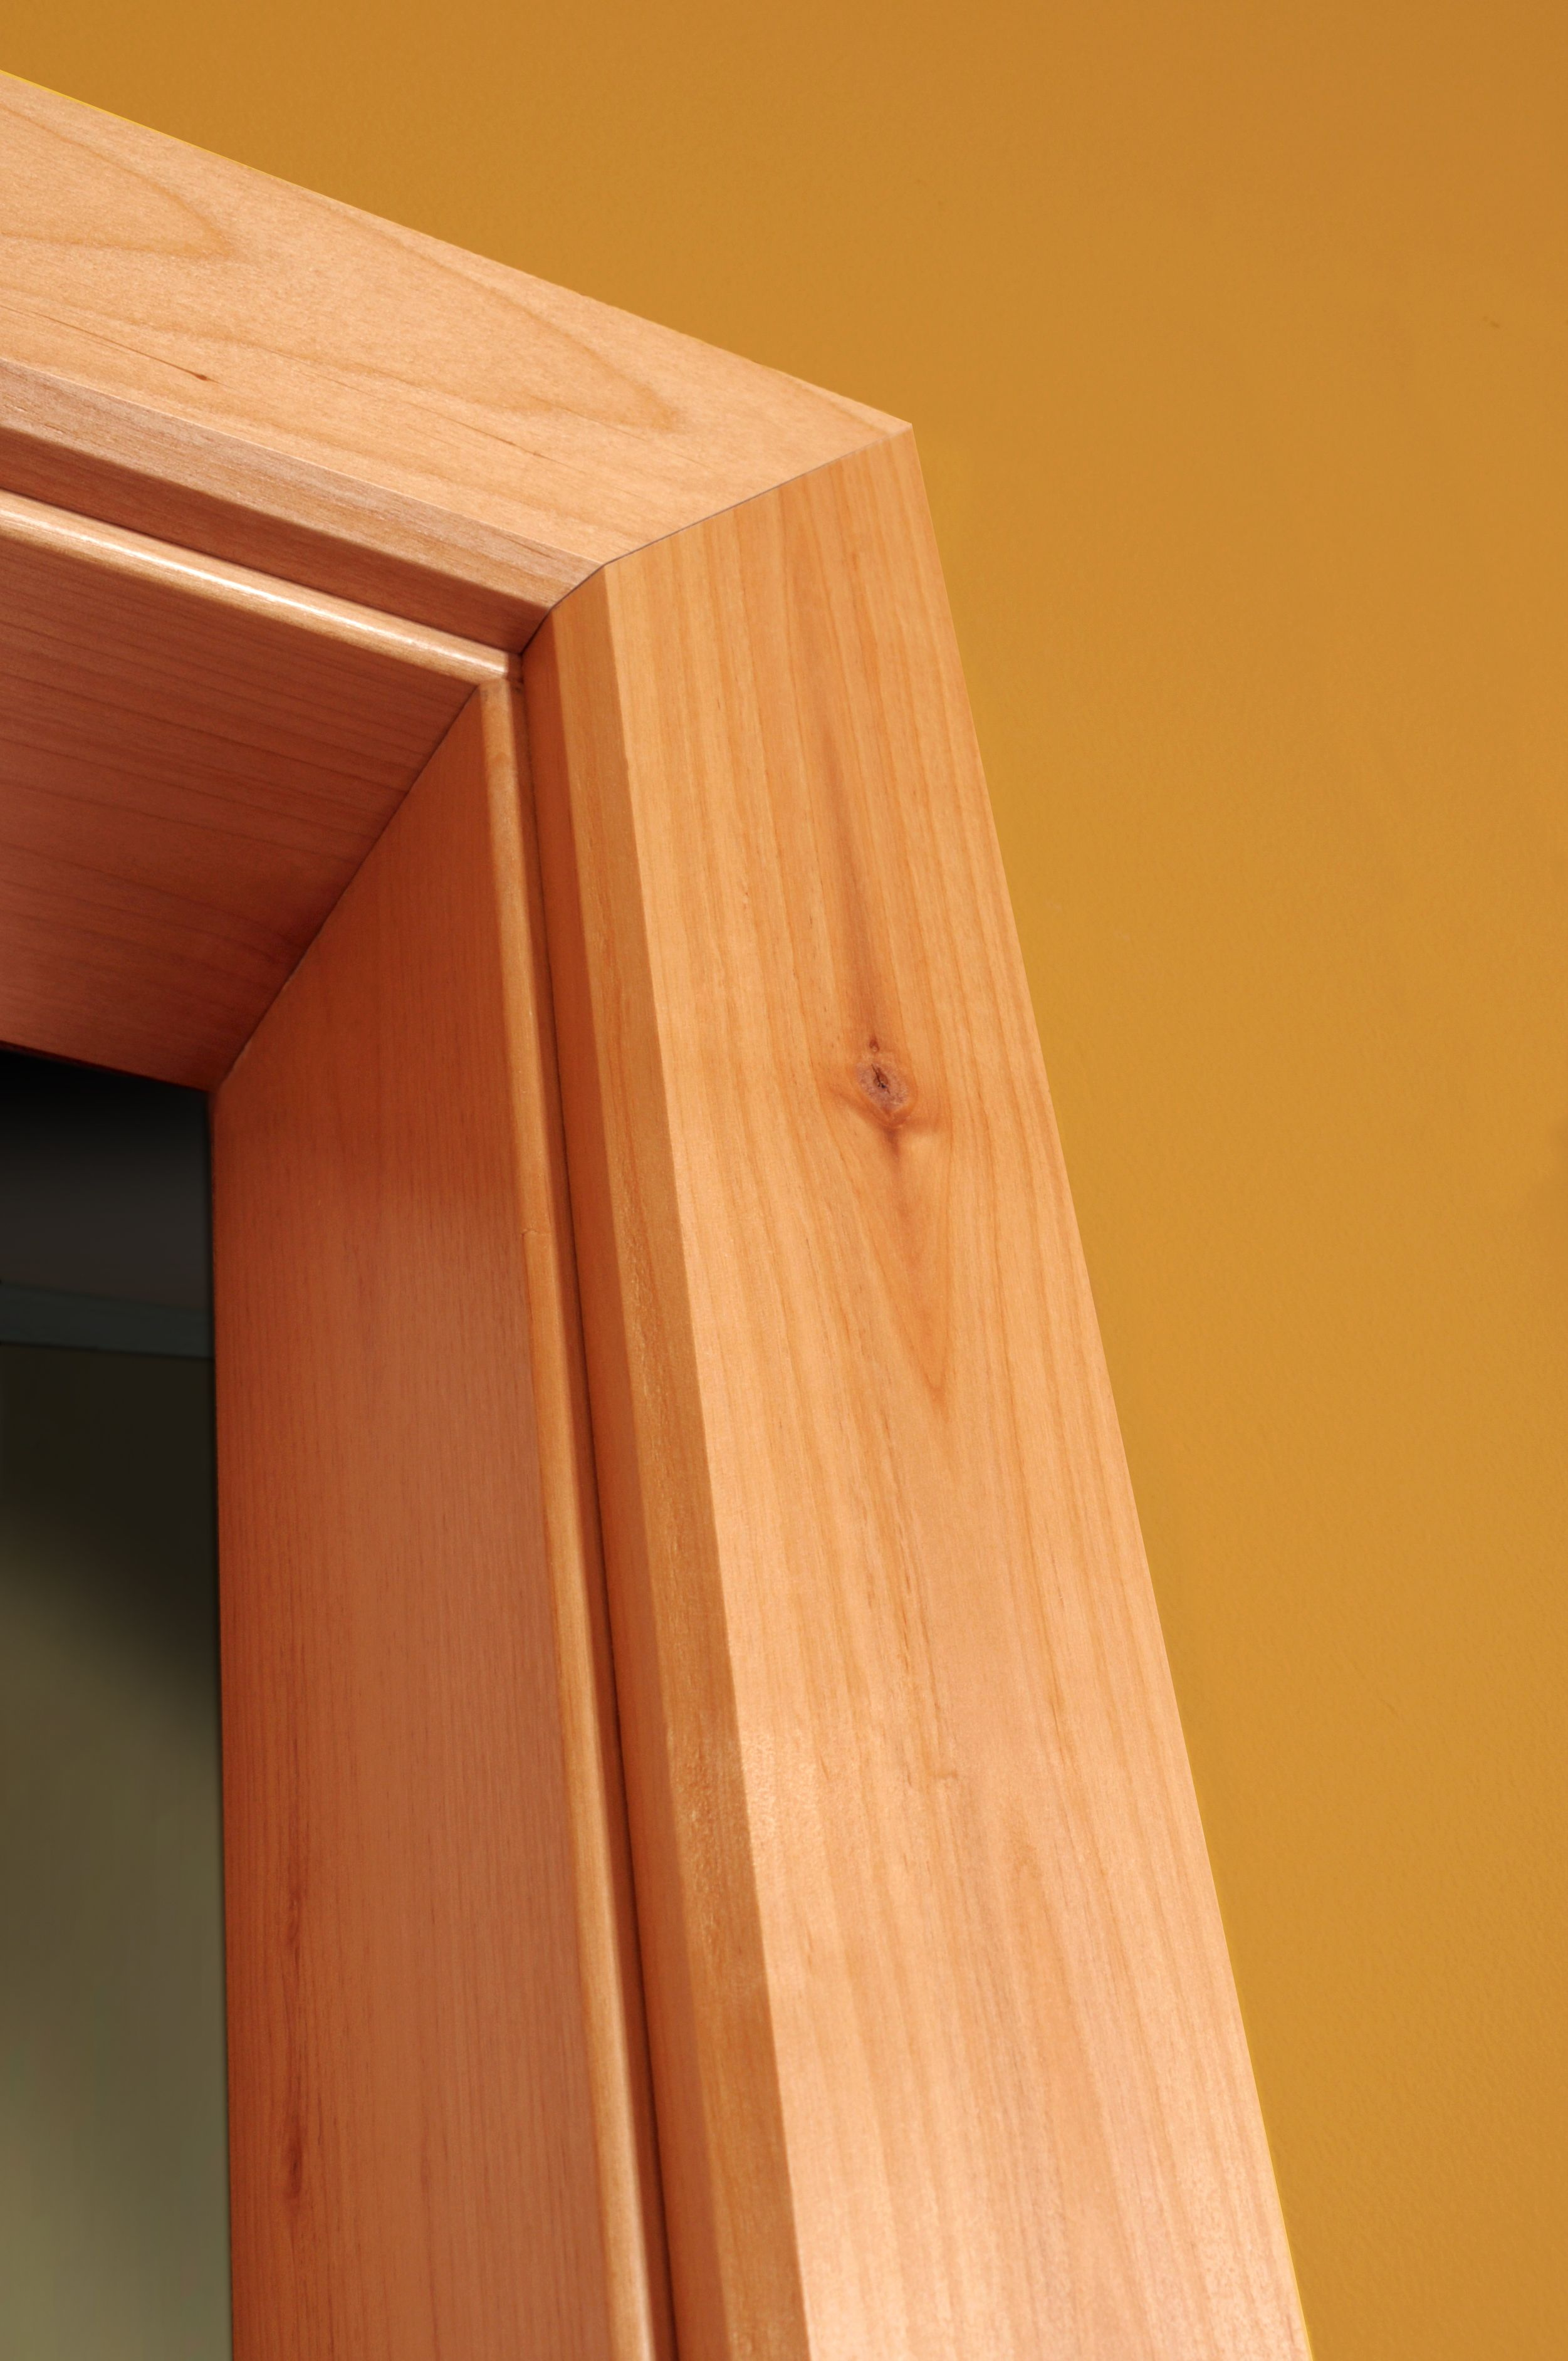 Natural Veneered Wooden Flush Door Design Mdf Living Room: Architectural Series- Rustic. Natural Knotty Alder